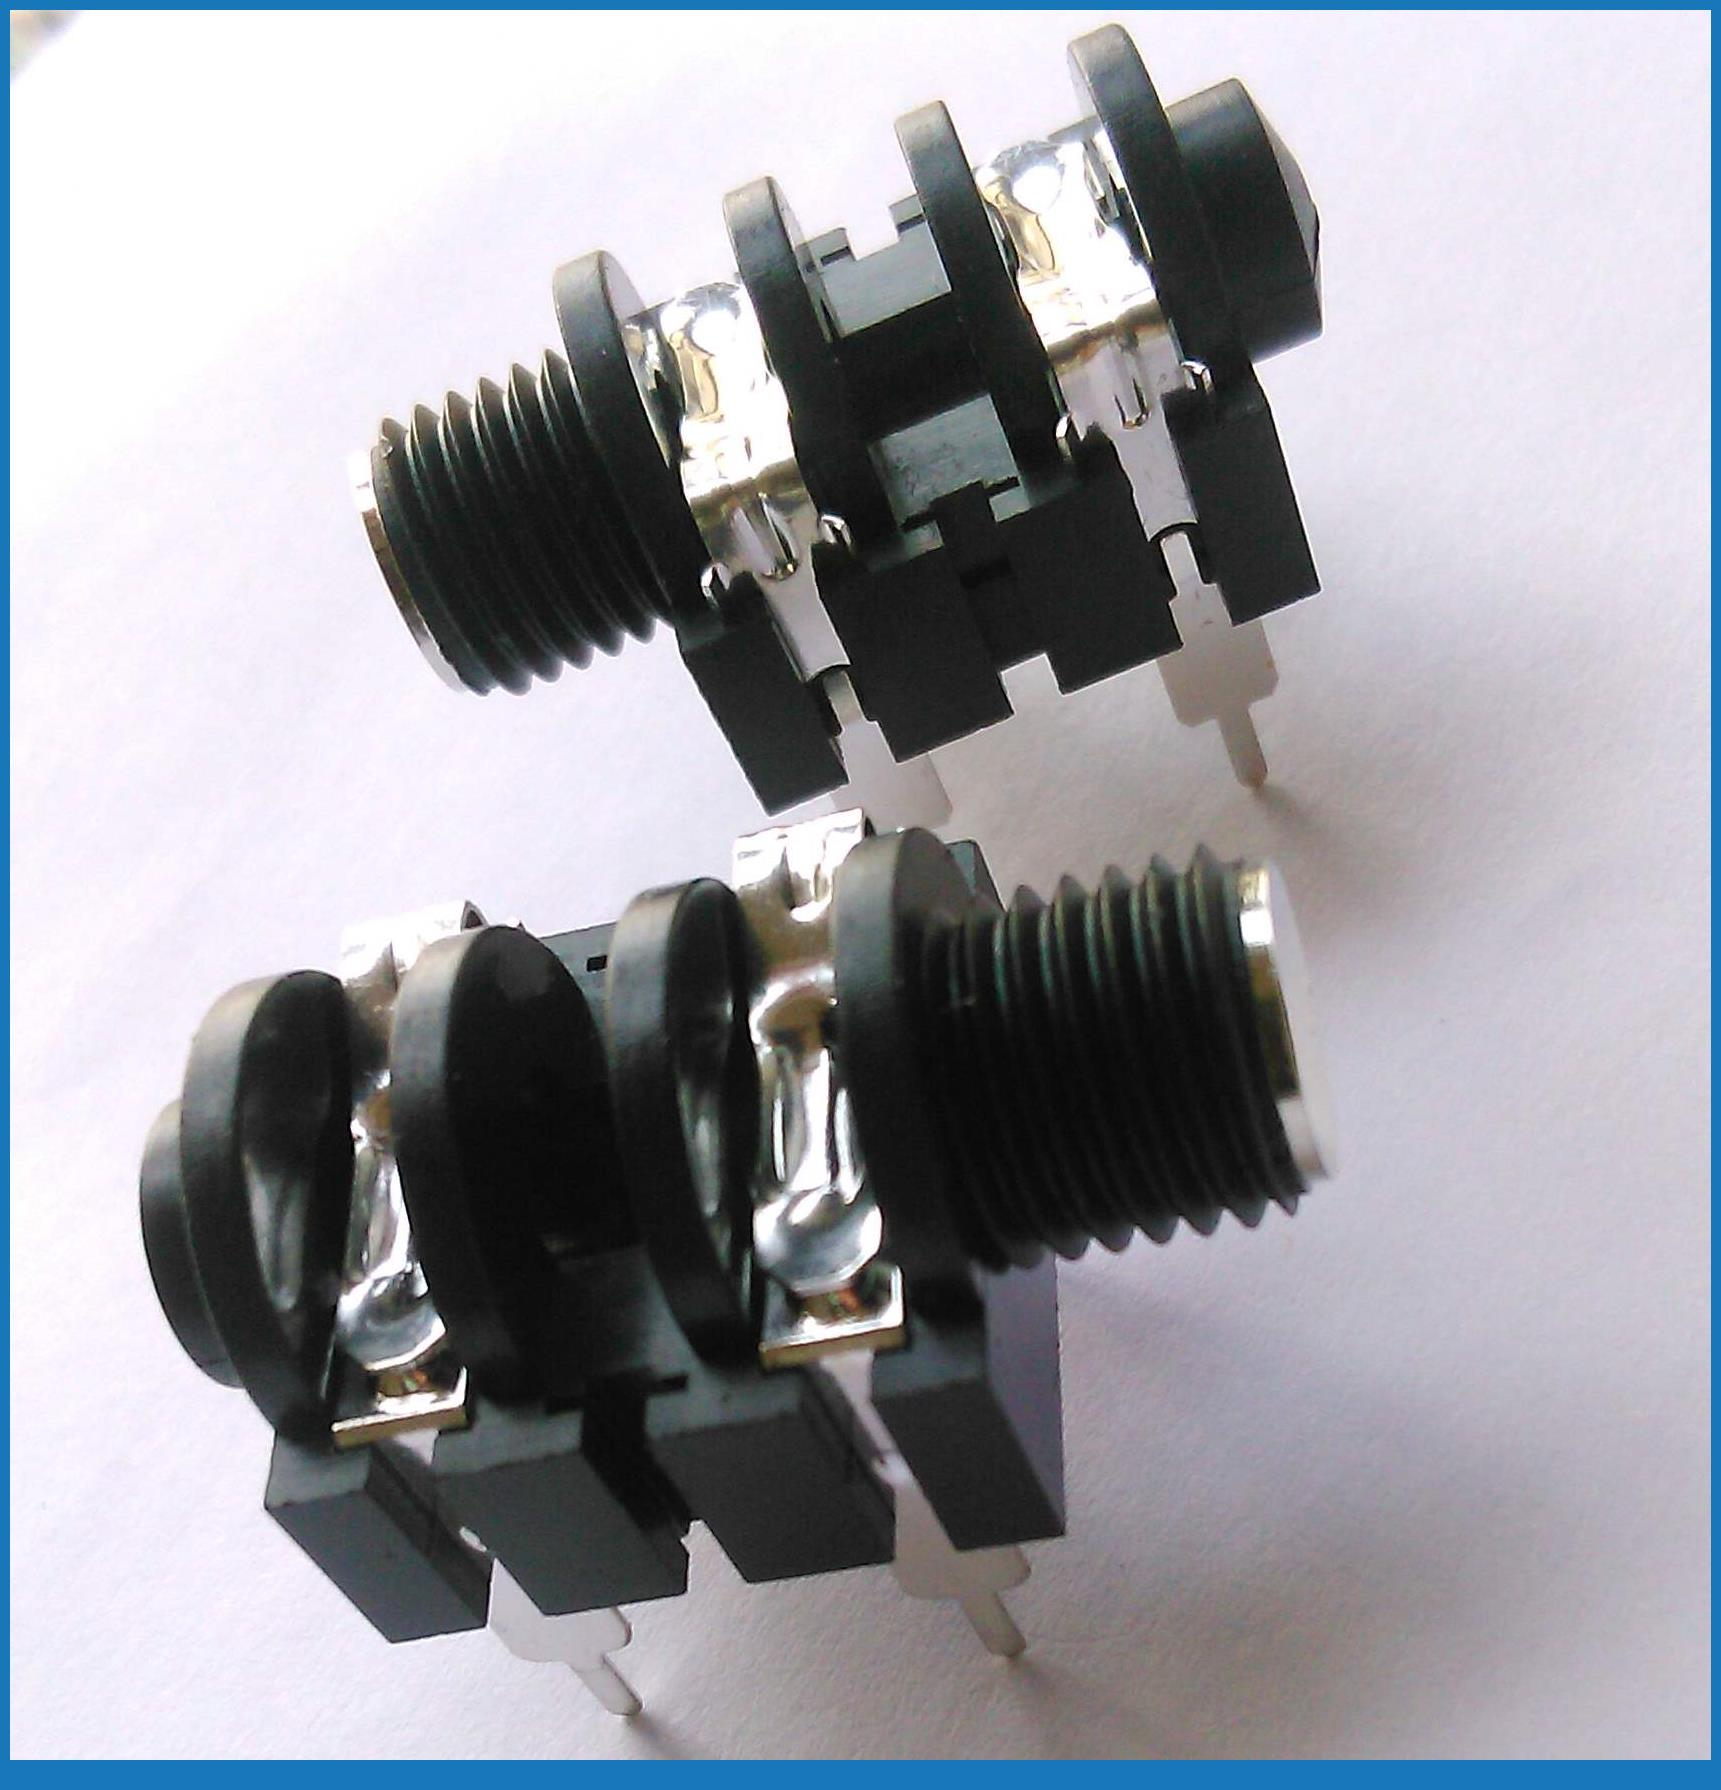 Mono Headphone Wiring Diagram Directv Satellite Jack Blog 10pcs 6 35mm Microphone 1 4 Panel Socket Guitar